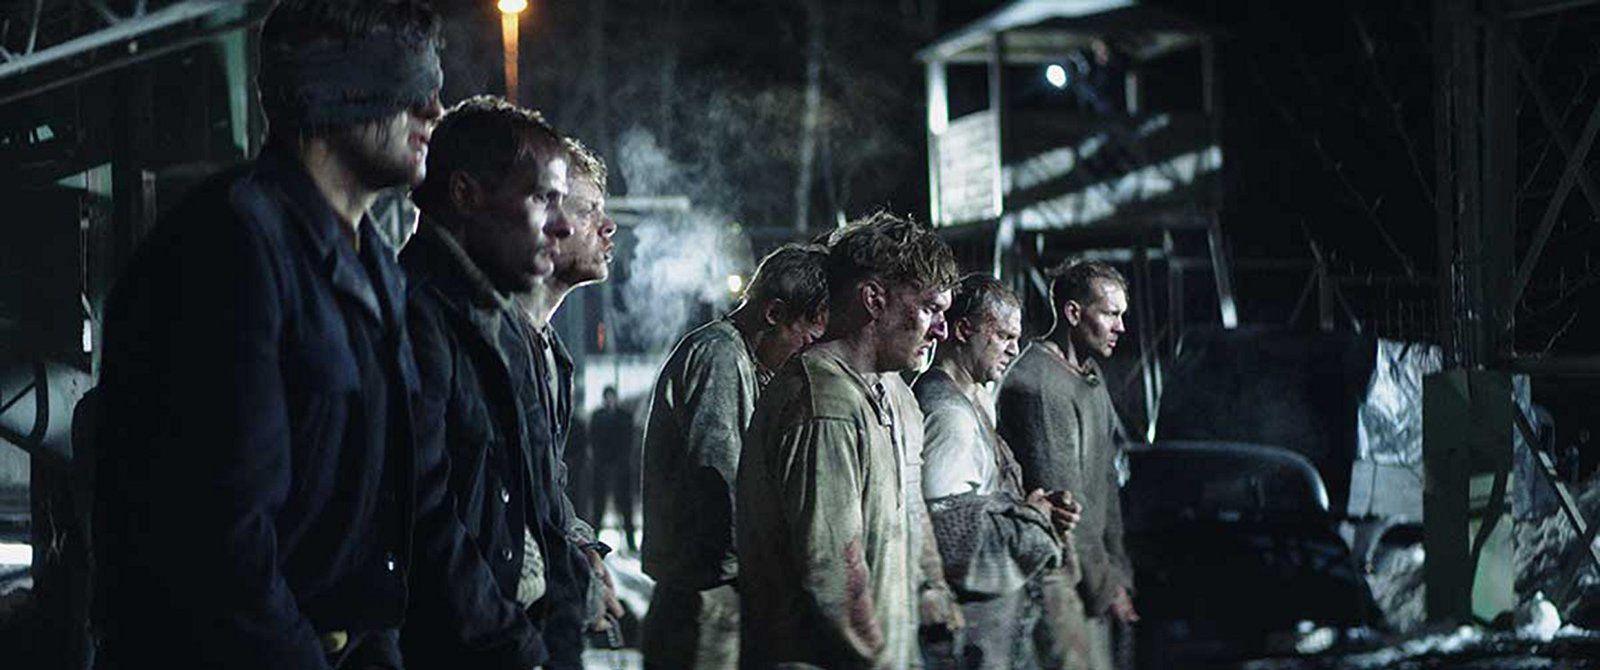 The 12th Man (BANDE-ANNONCE VO) avec Jonathan Rhys Meyers, Thomas Gullestad, Mads Sjøgård Pettersen